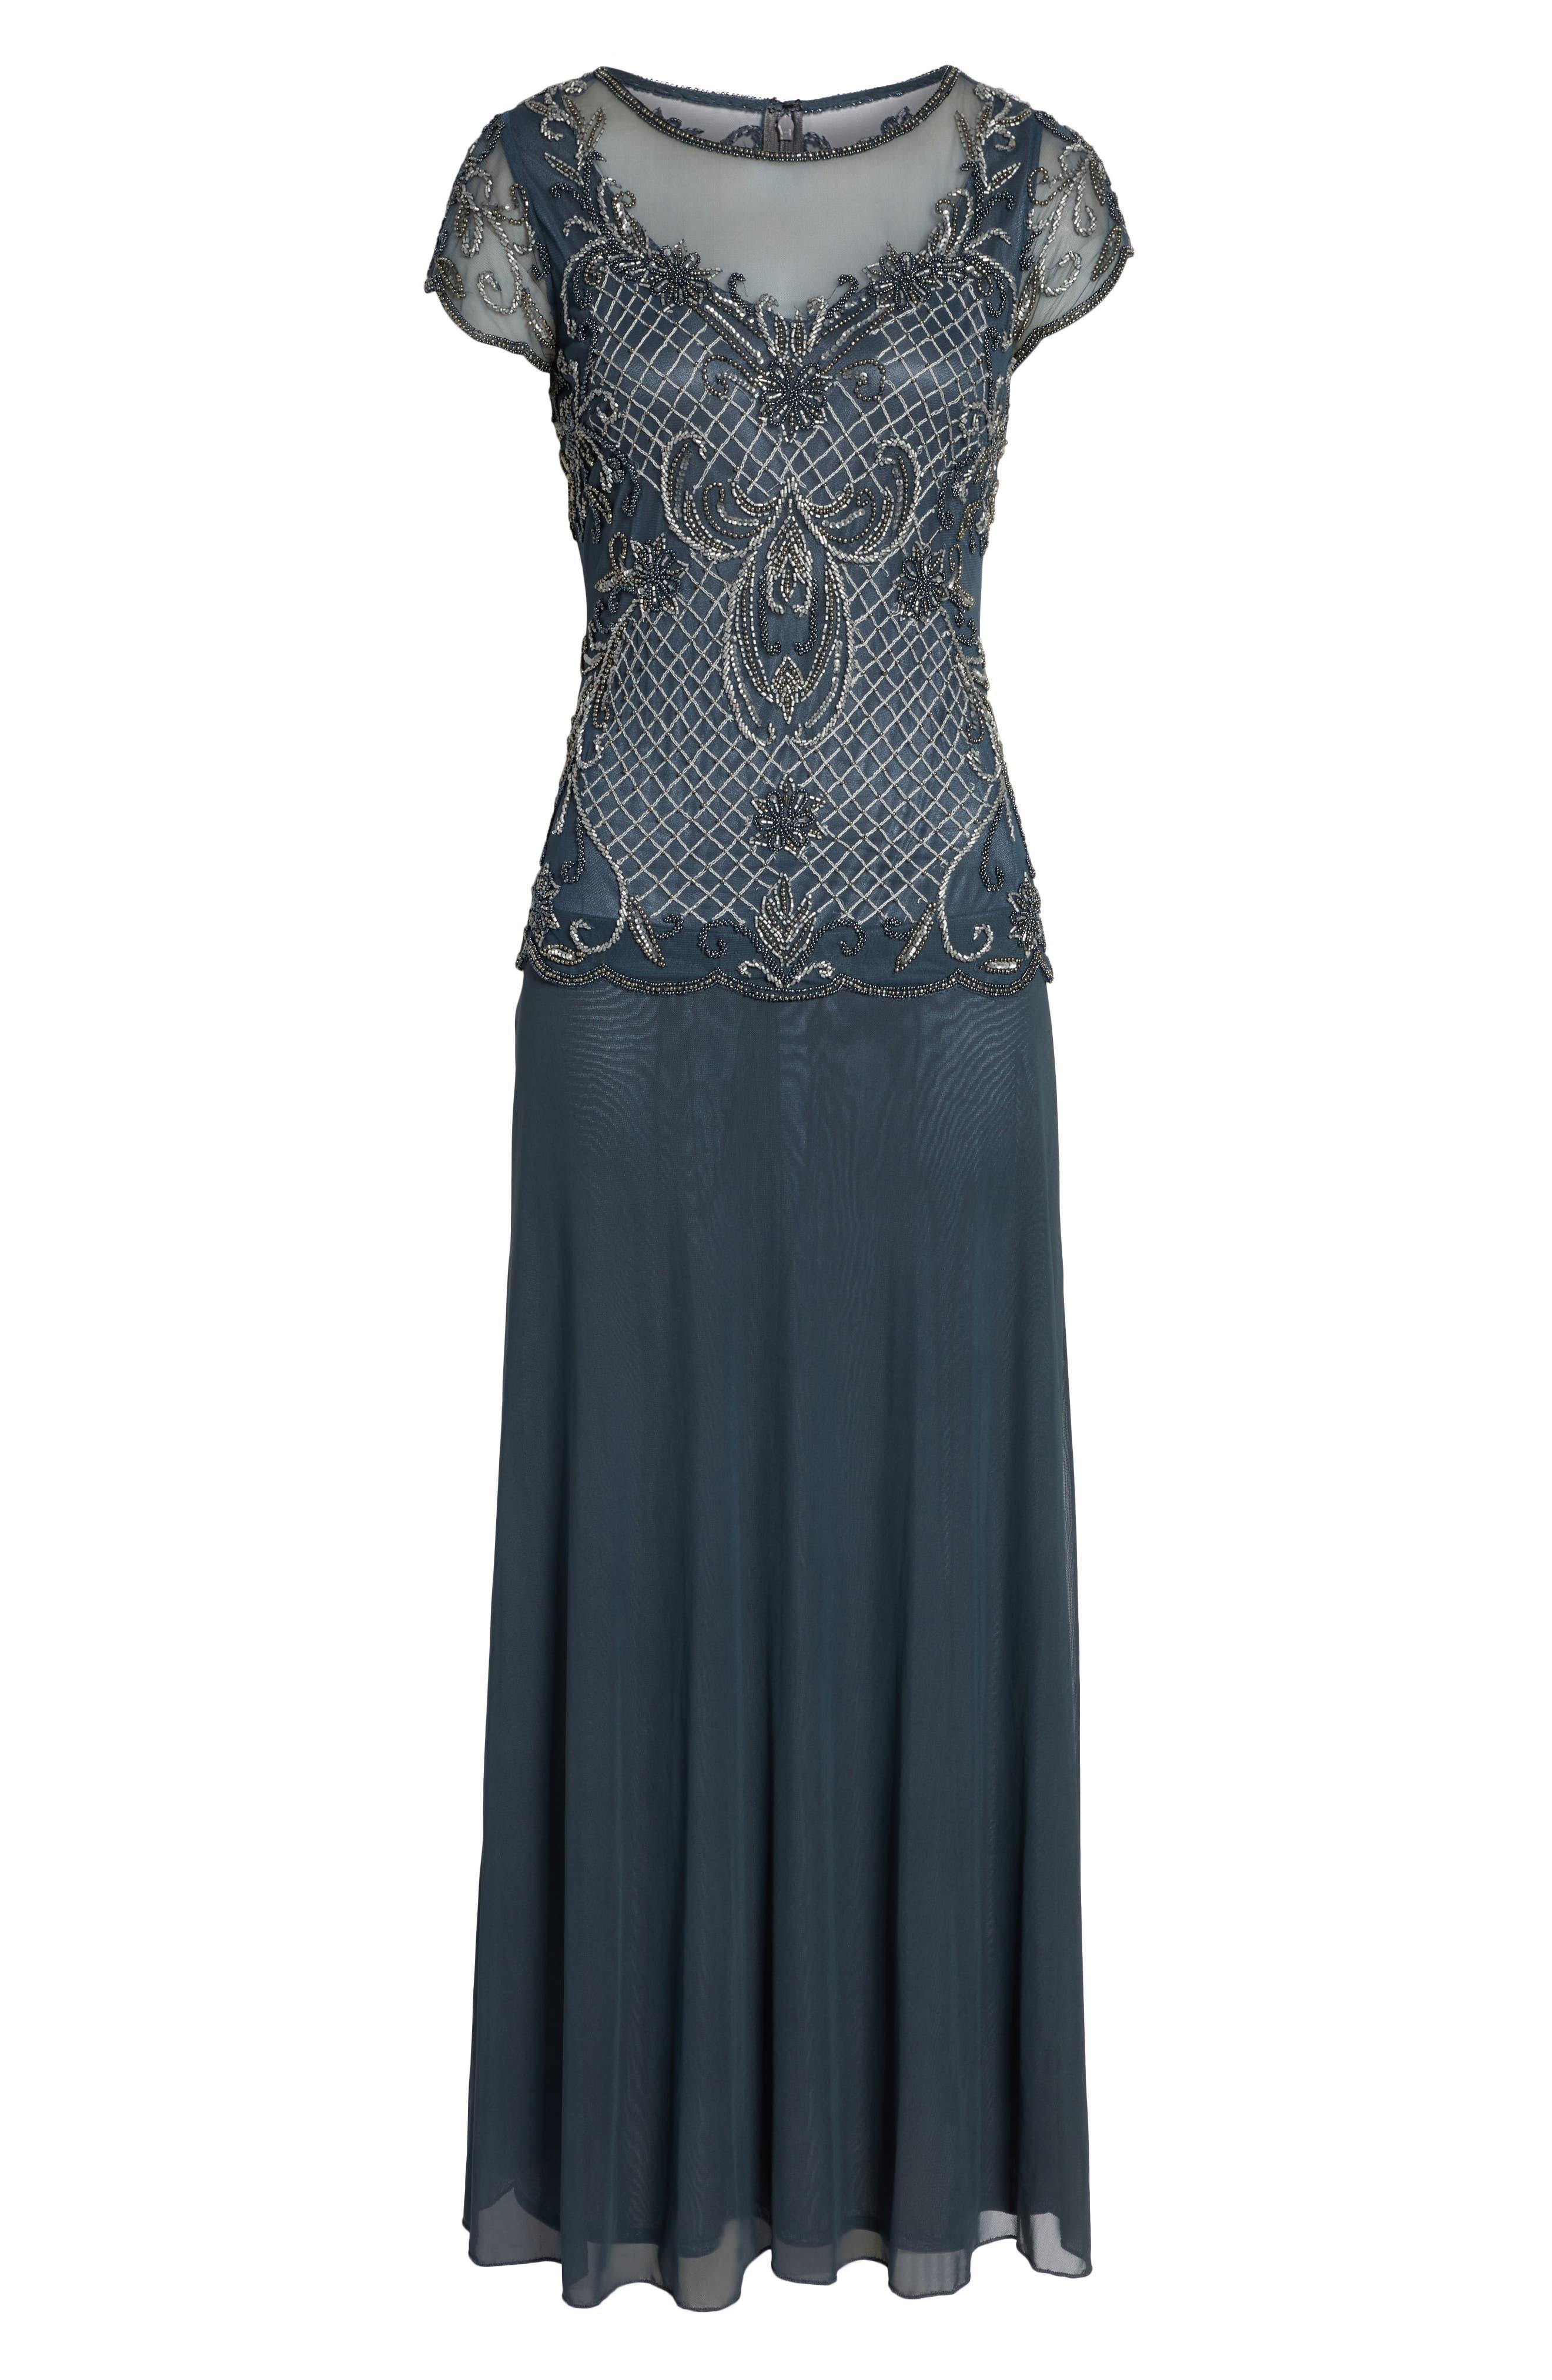 Mock Two-Piece Beaded Bodice Evening Dress,                             Alternate thumbnail 7, color,                             SLATE